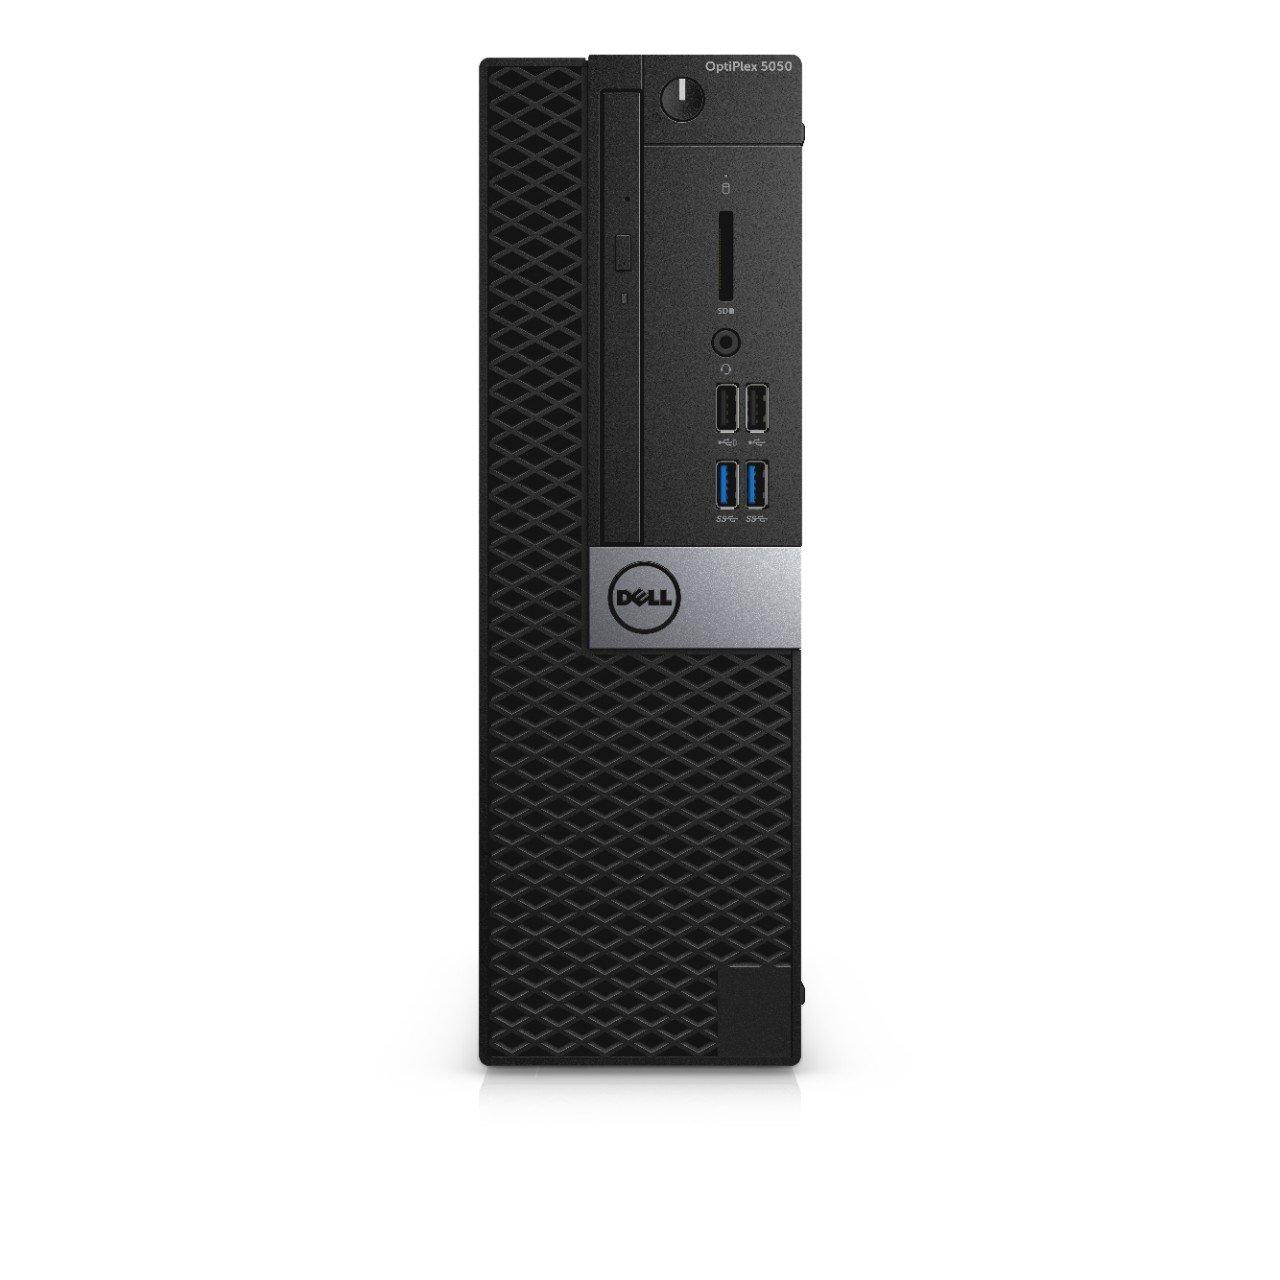 Dell H60K4 OptiPlex 5050 Small Form Factor Desktop, Intel Core i5-7500, 8GB RAM, 500GB HDD, Black by Dell (Image #2)